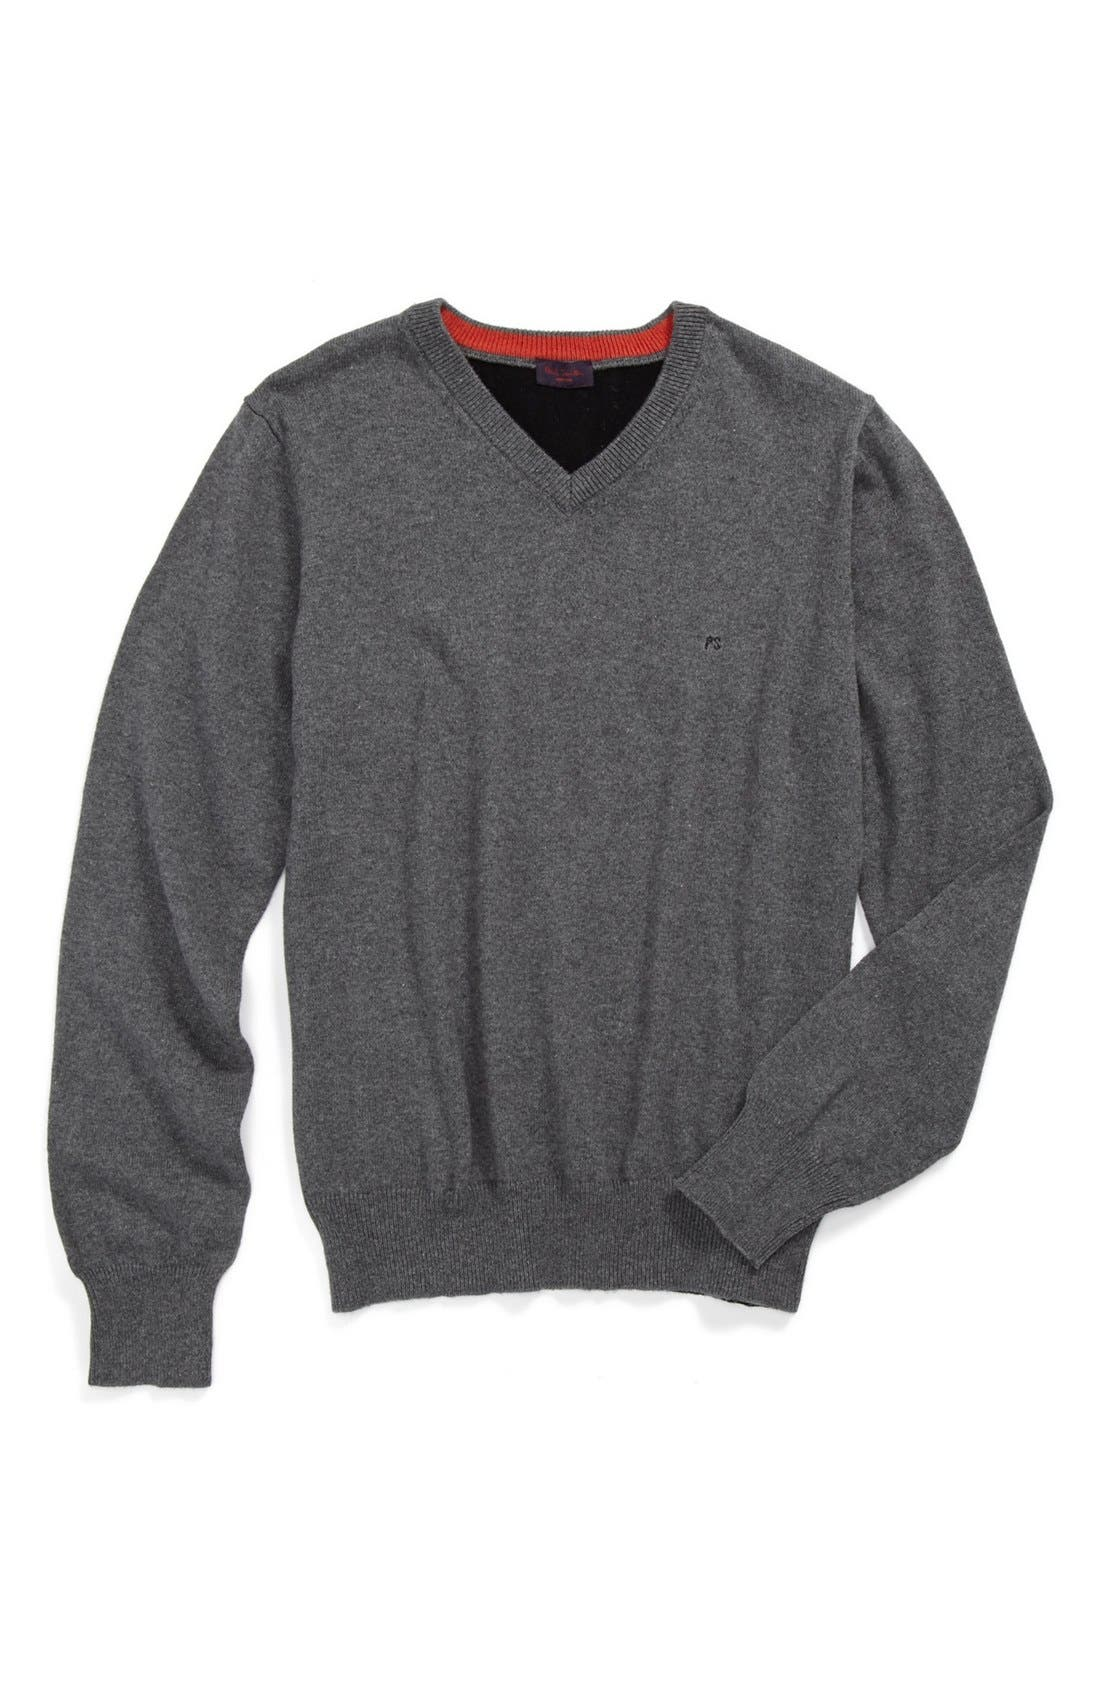 Main Image - Paul Smith Junior Sweater (Toddler Boys)